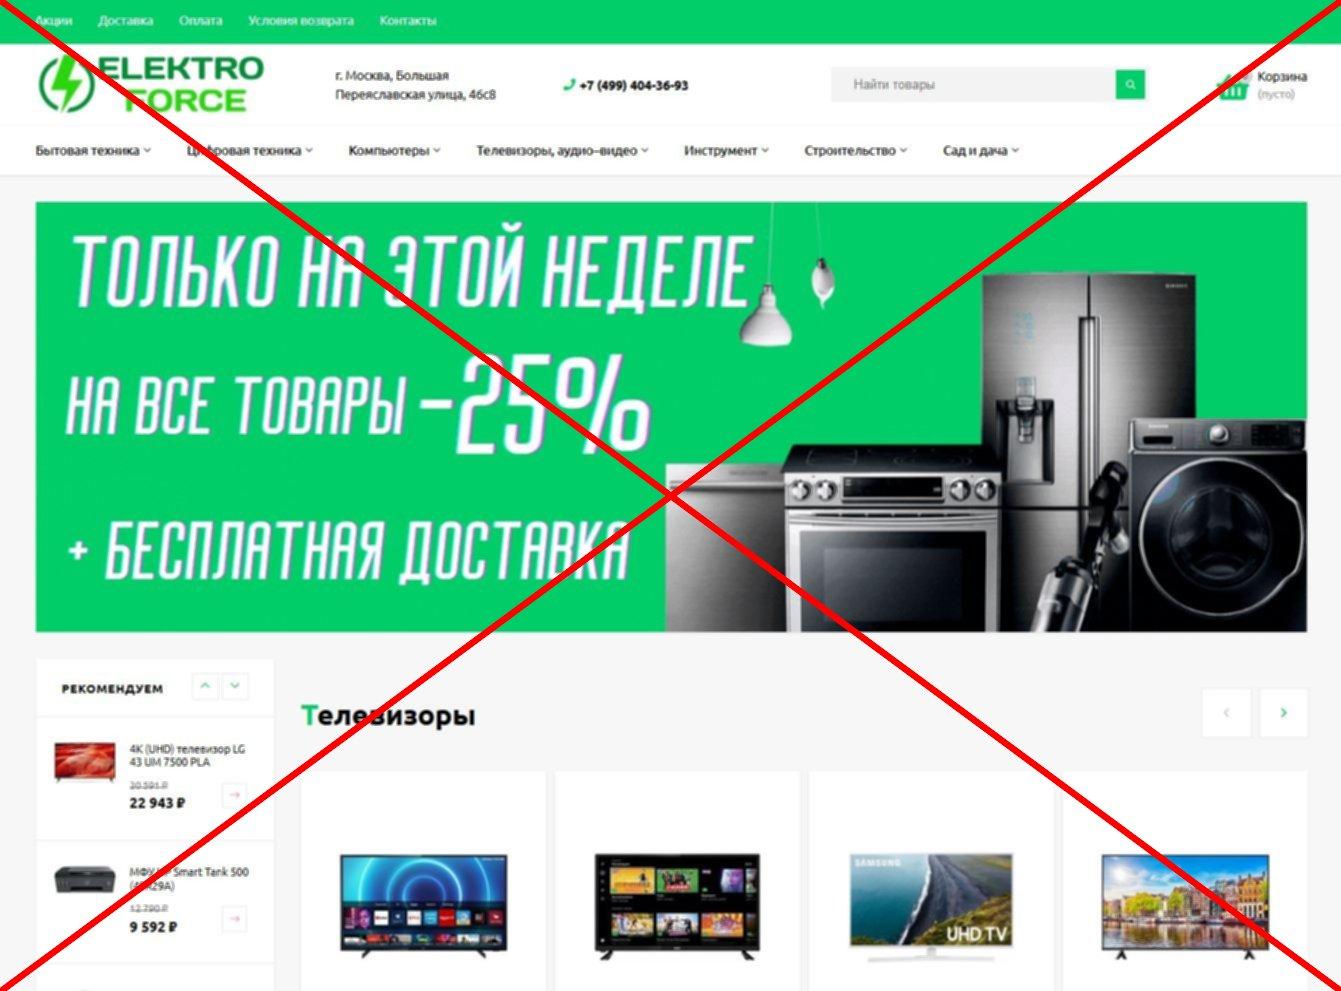 Скрин forceelektro.ru